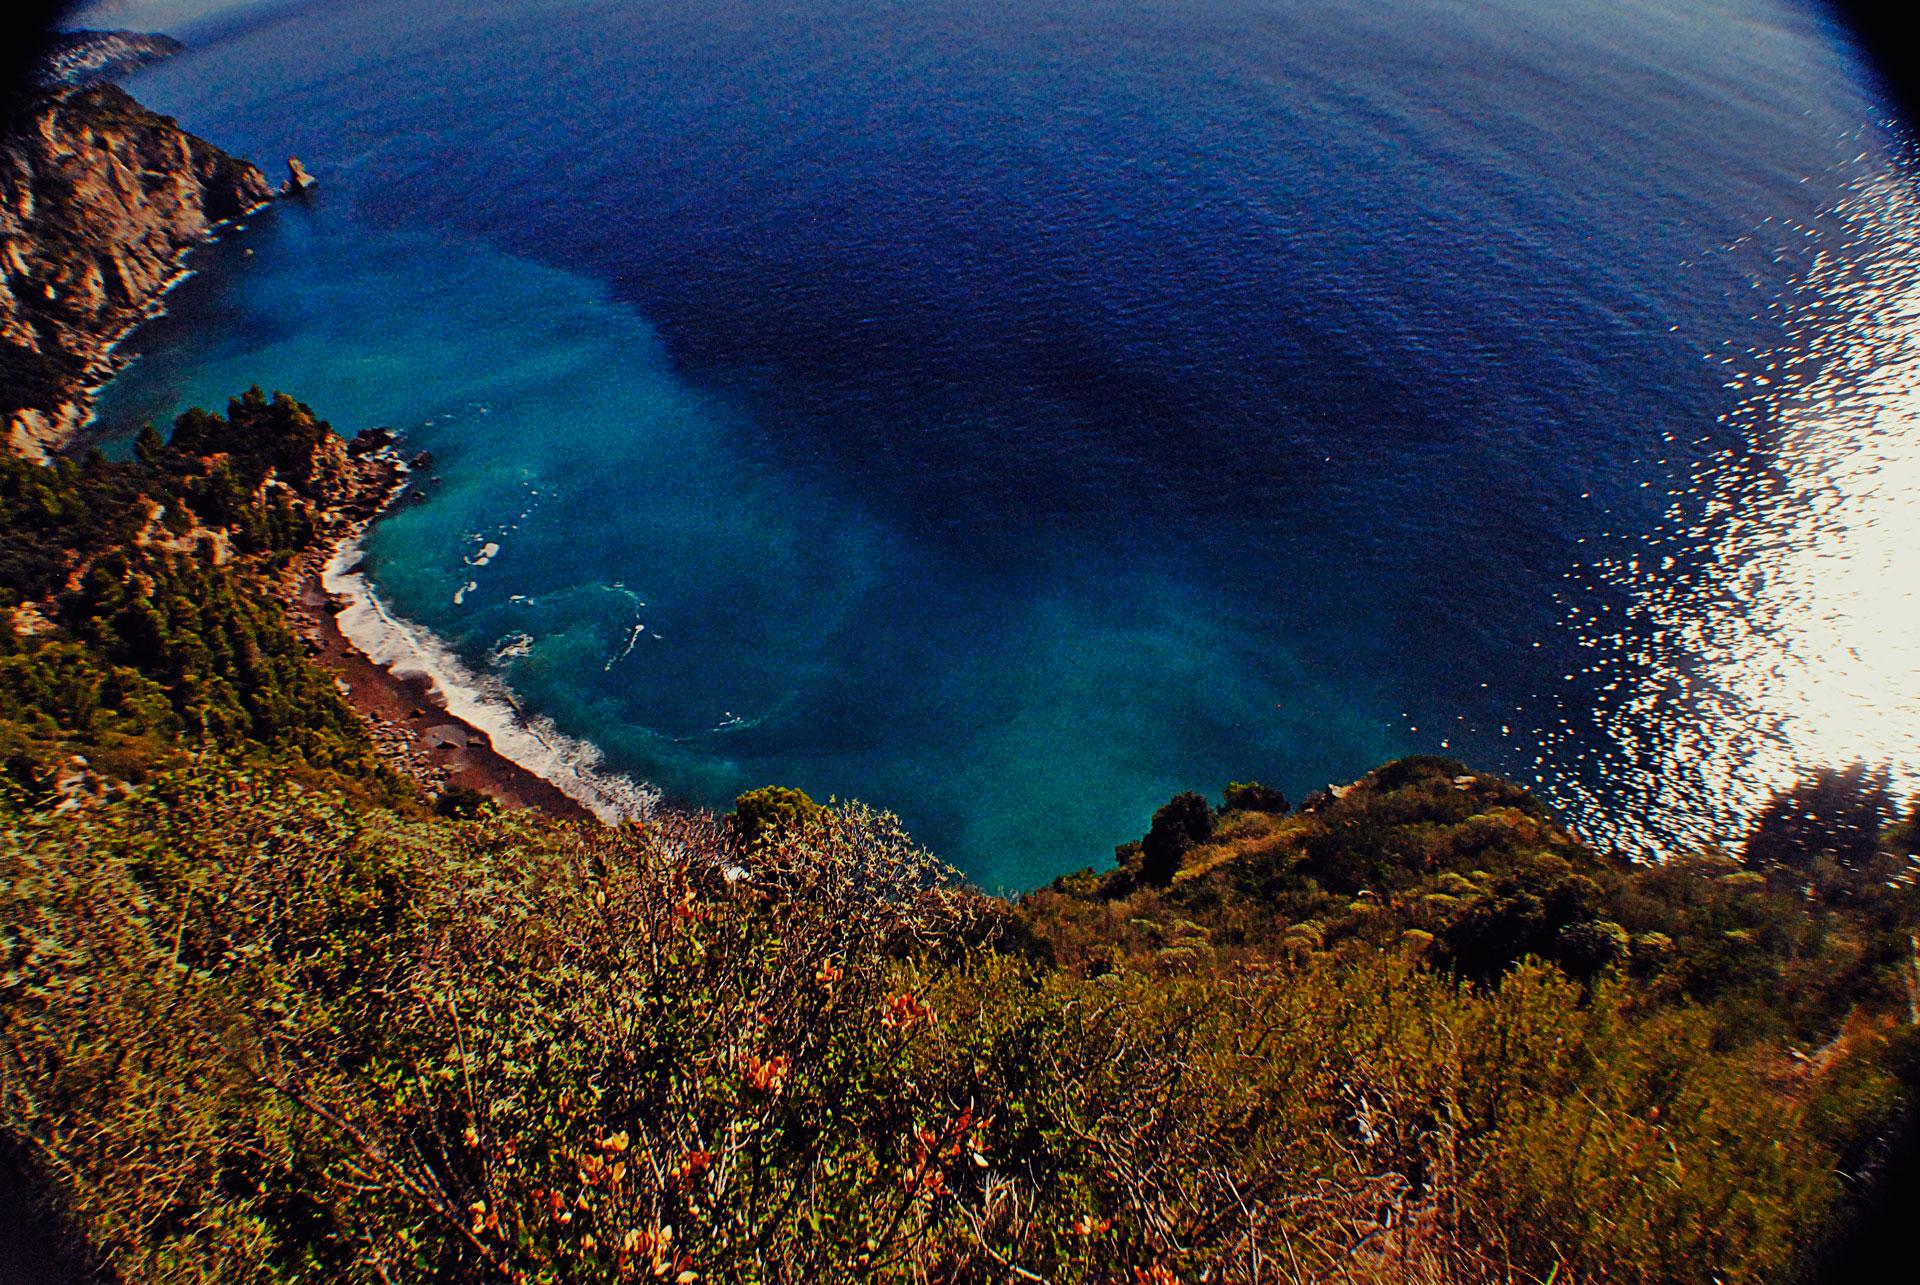 Pompeii Positano Amalfi Coast Day Tour With Private Driver Guide